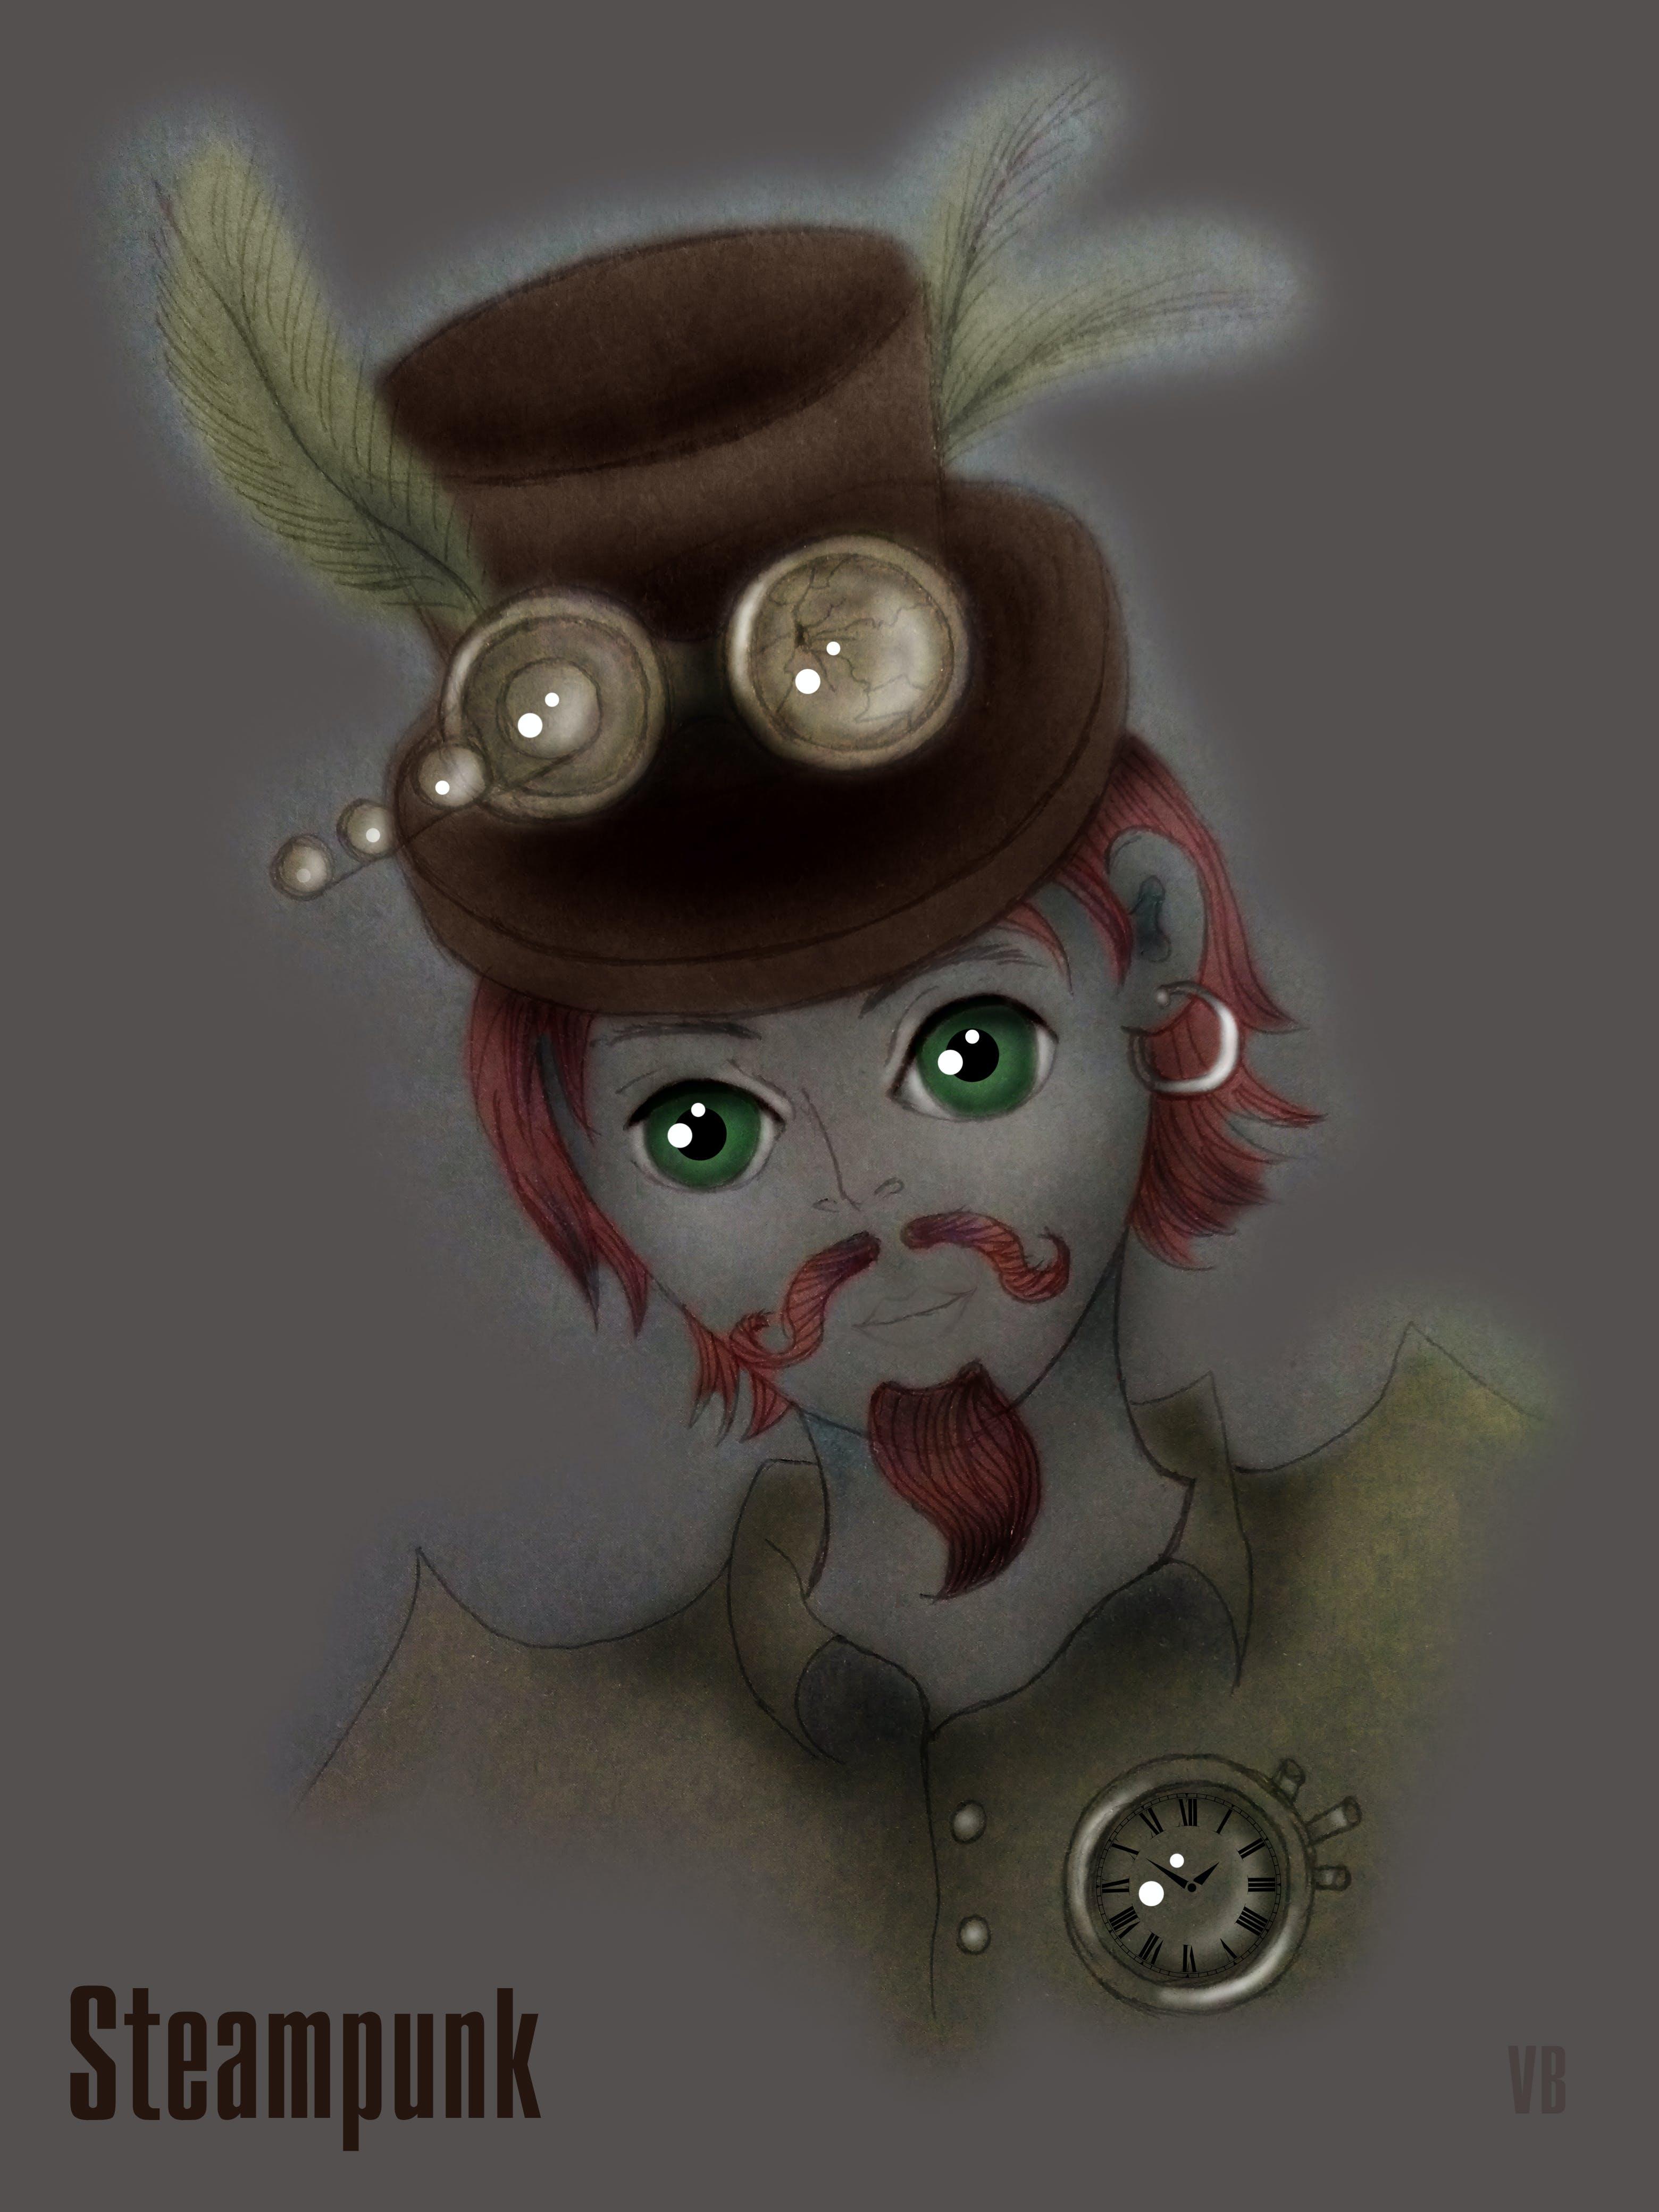 Free stock photo of steampunk